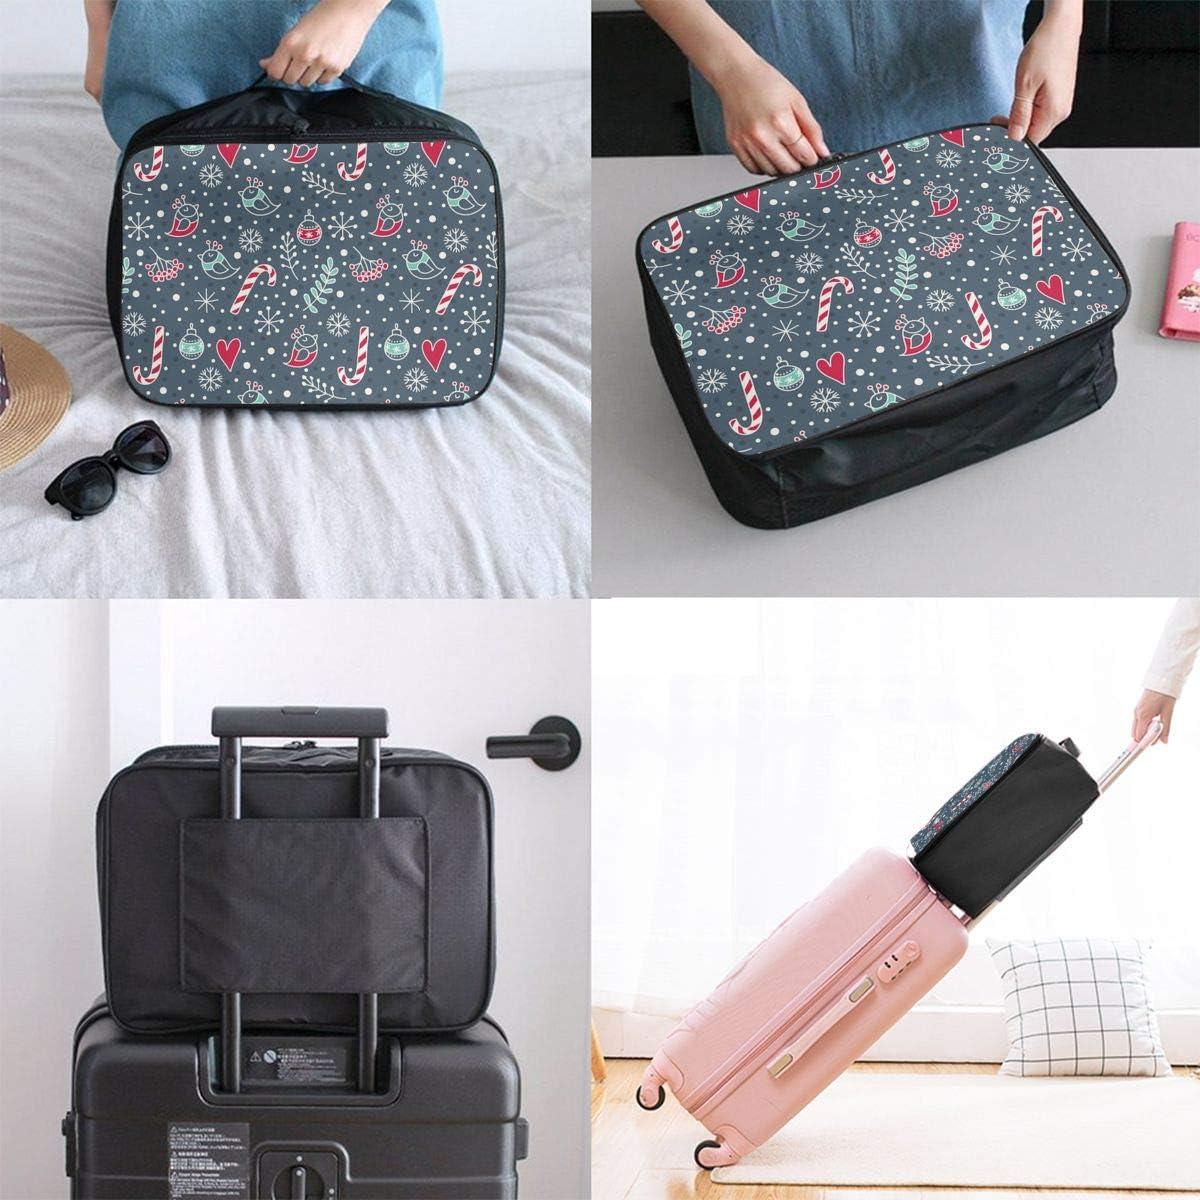 Navy Christmas Travel Carry-on Luggage Weekender Bag Overnight Tote Flight Duffel In Trolley Handle